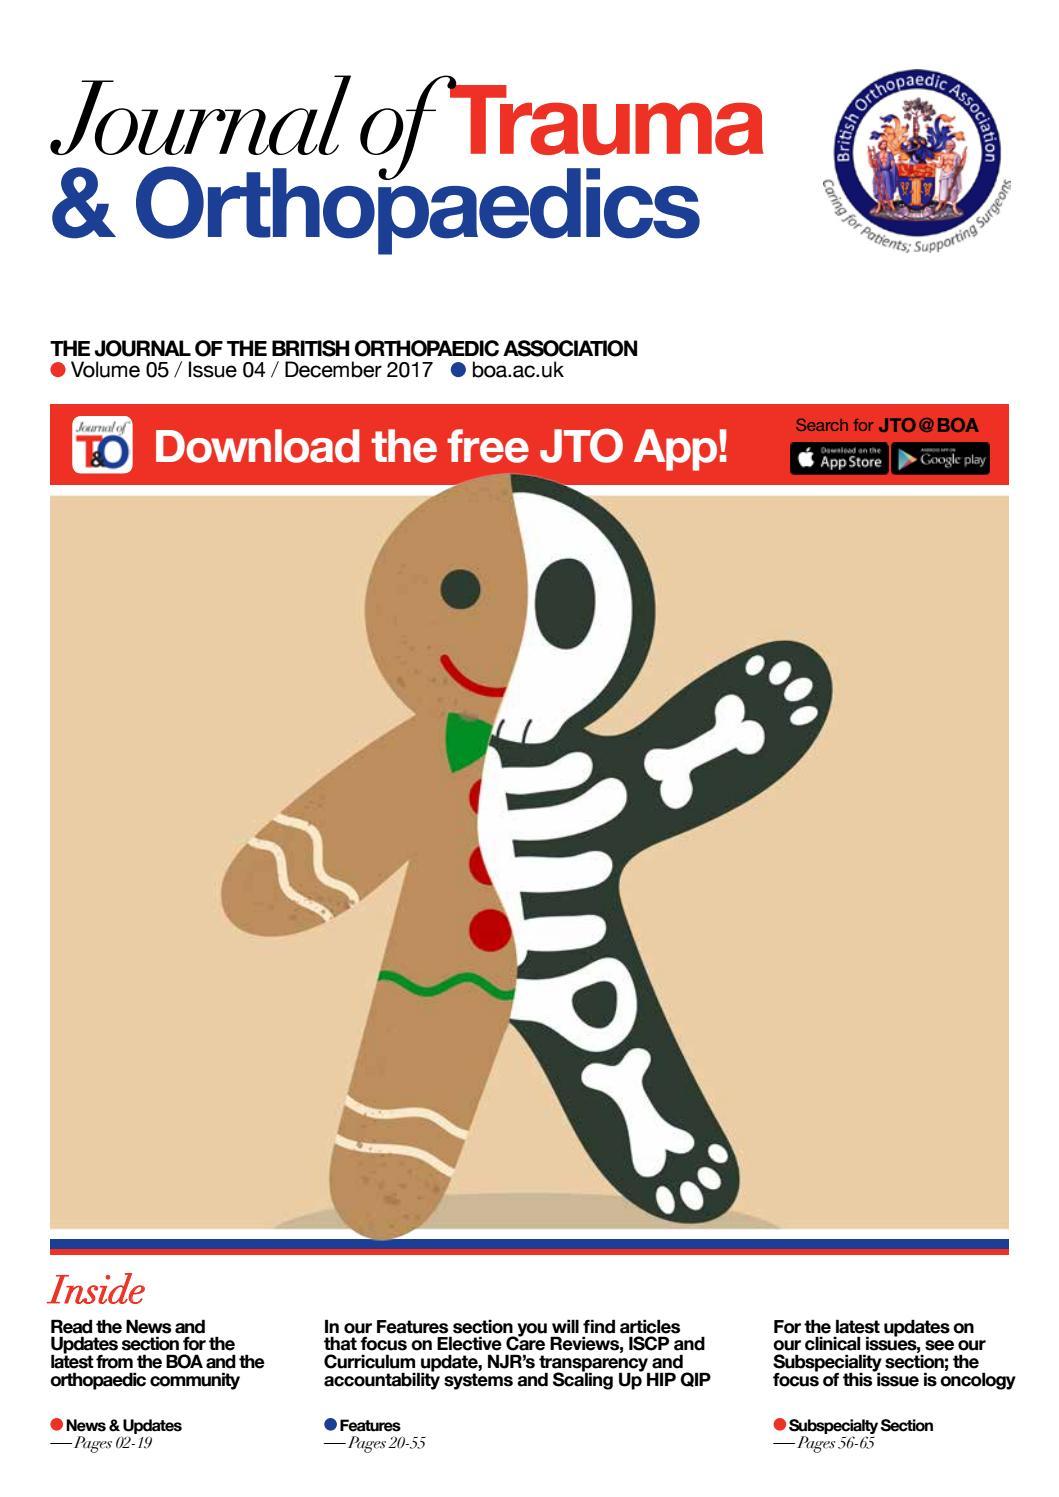 Journal of Trauma & Orthopaedics – Vol 5 / Iss 4 by British